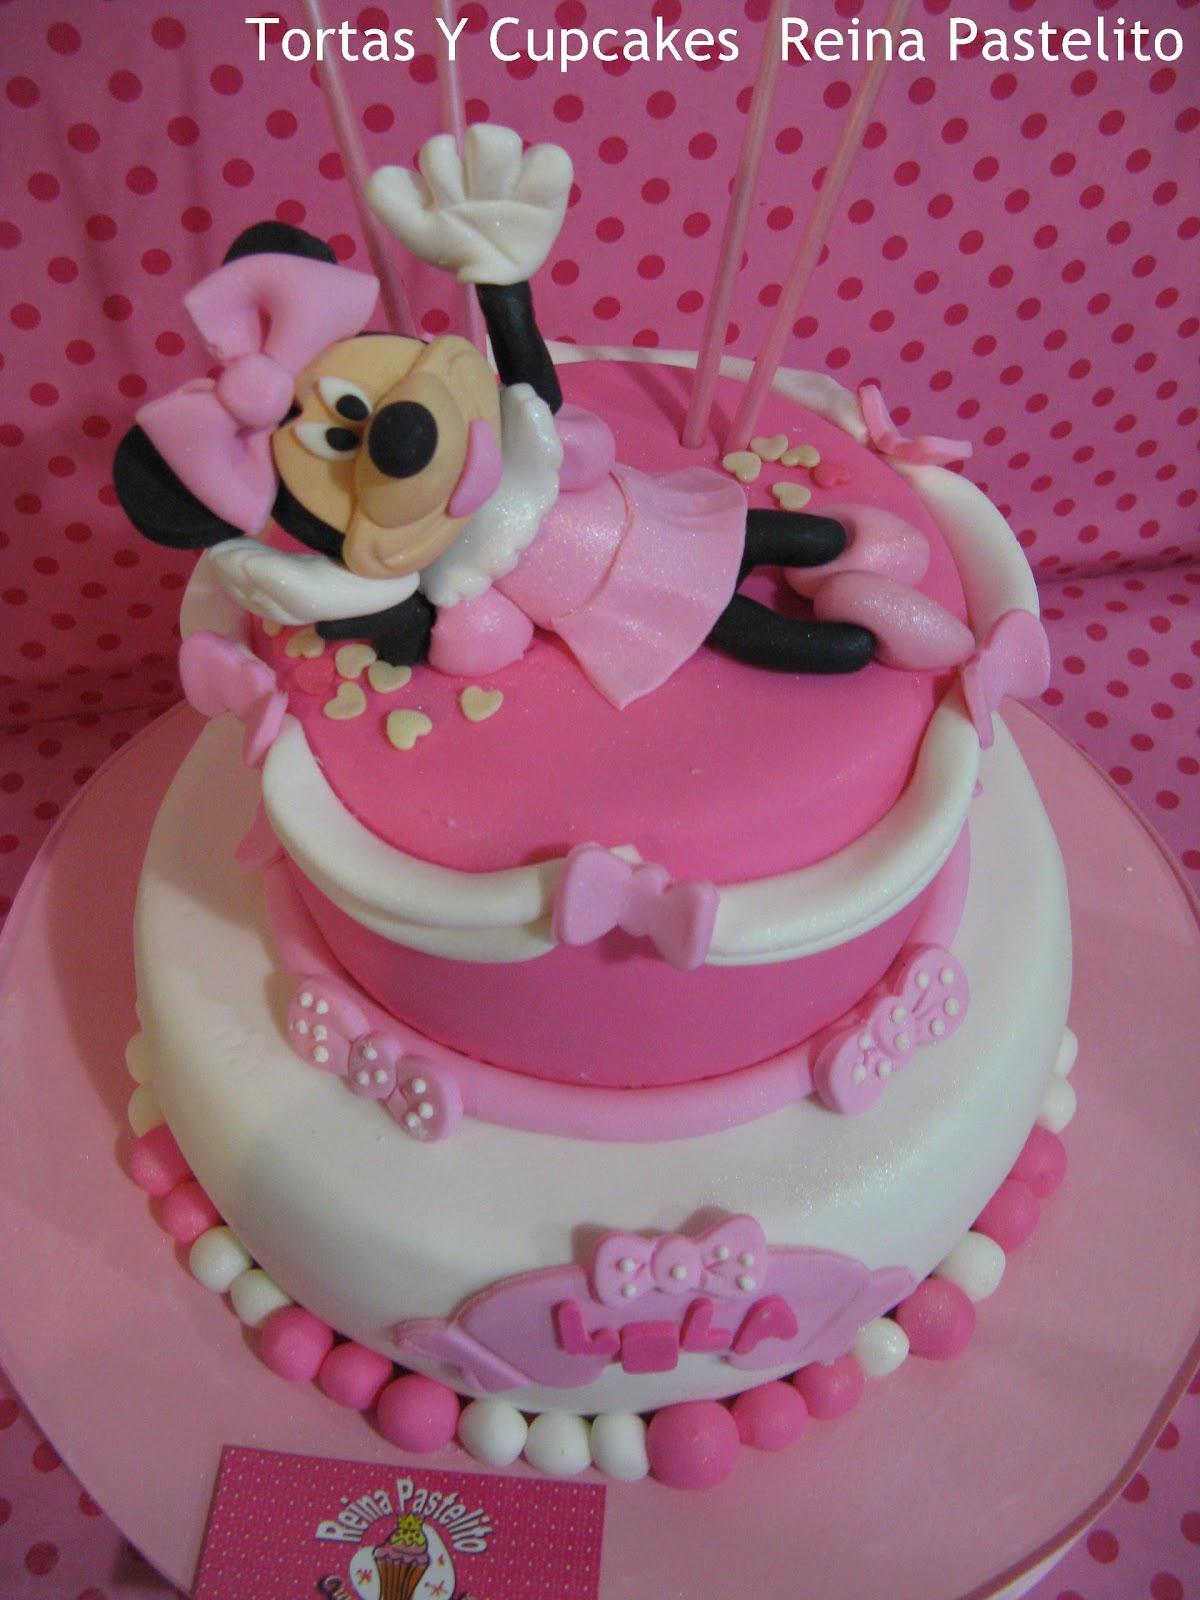 Reina Pastelito Cupcakes Tortas: Torta Minnie Mouse Cupcakes ...